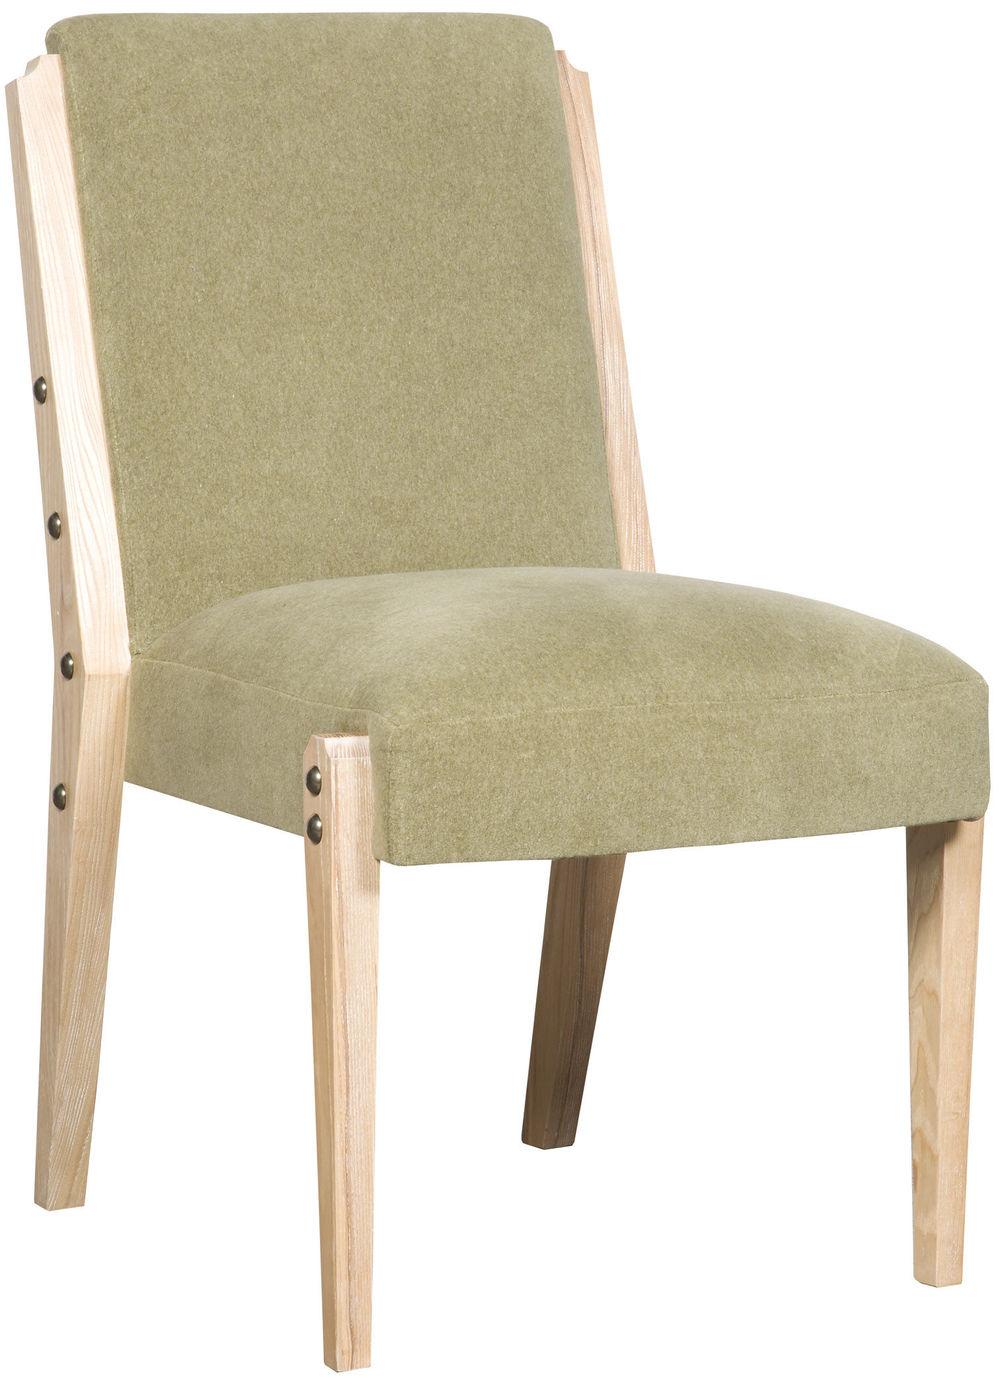 Vanguard Furniture - Minoa Side Chair